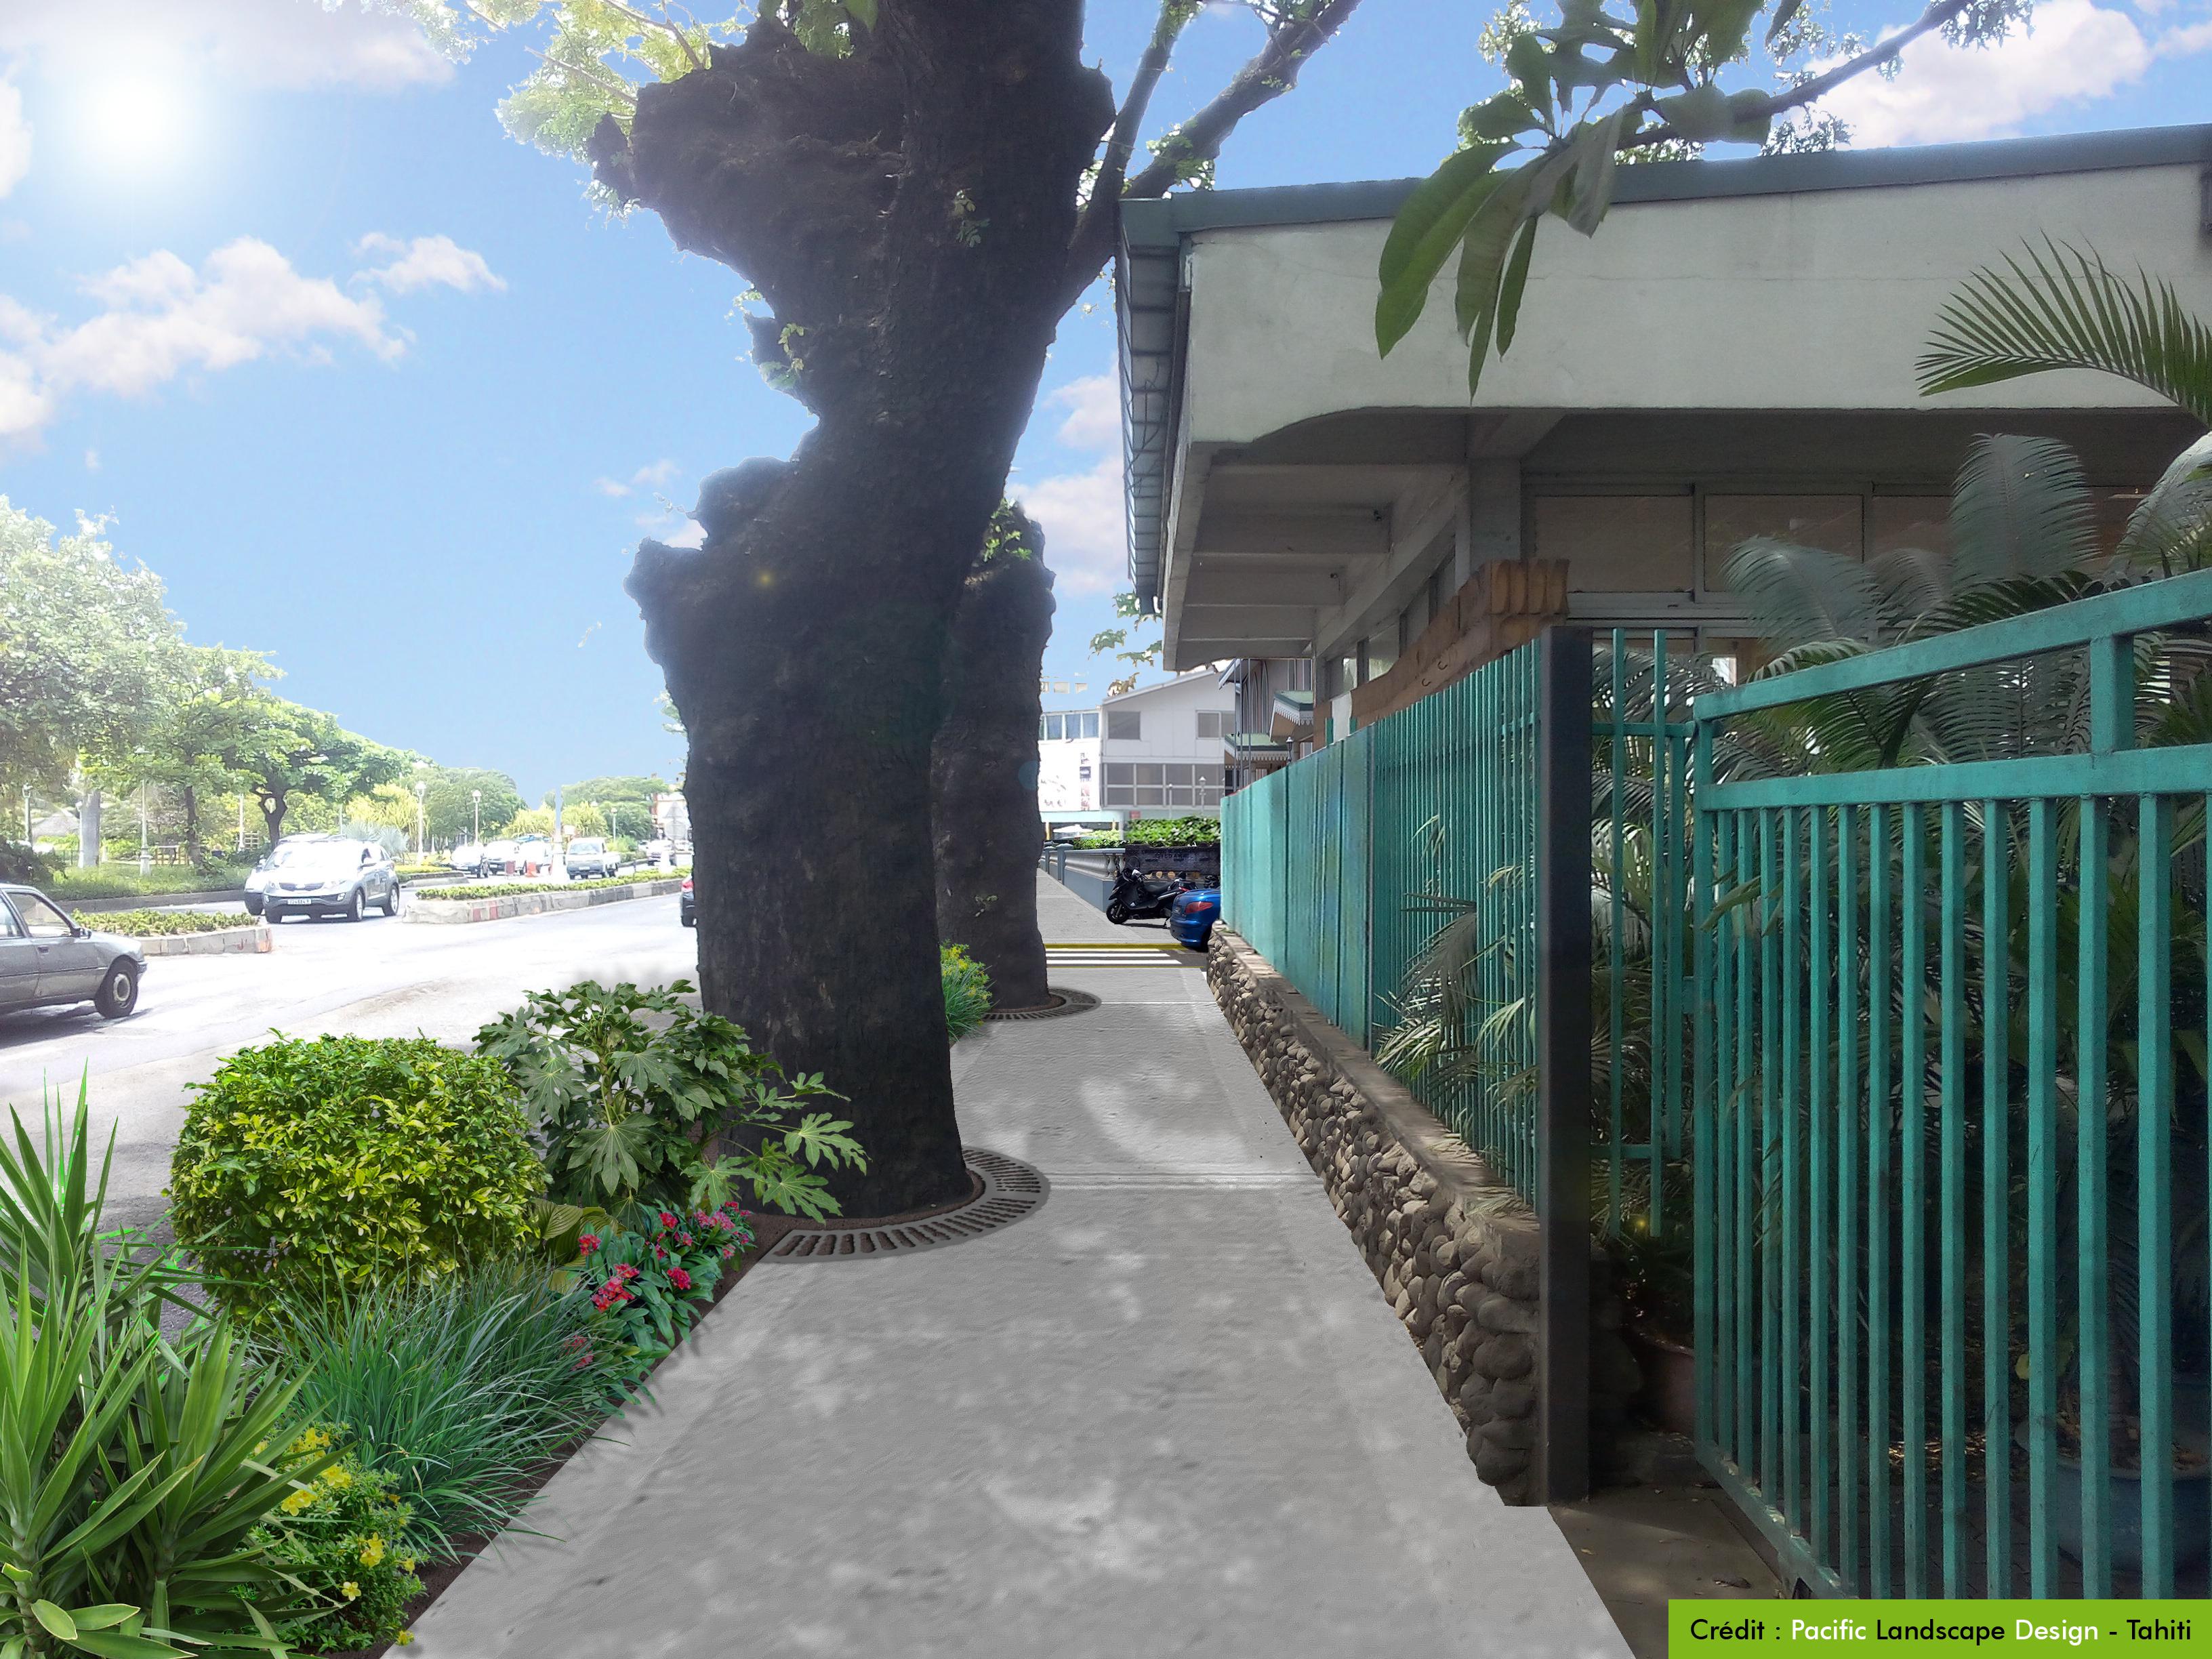 Trottoirs de Paofai, Papeete